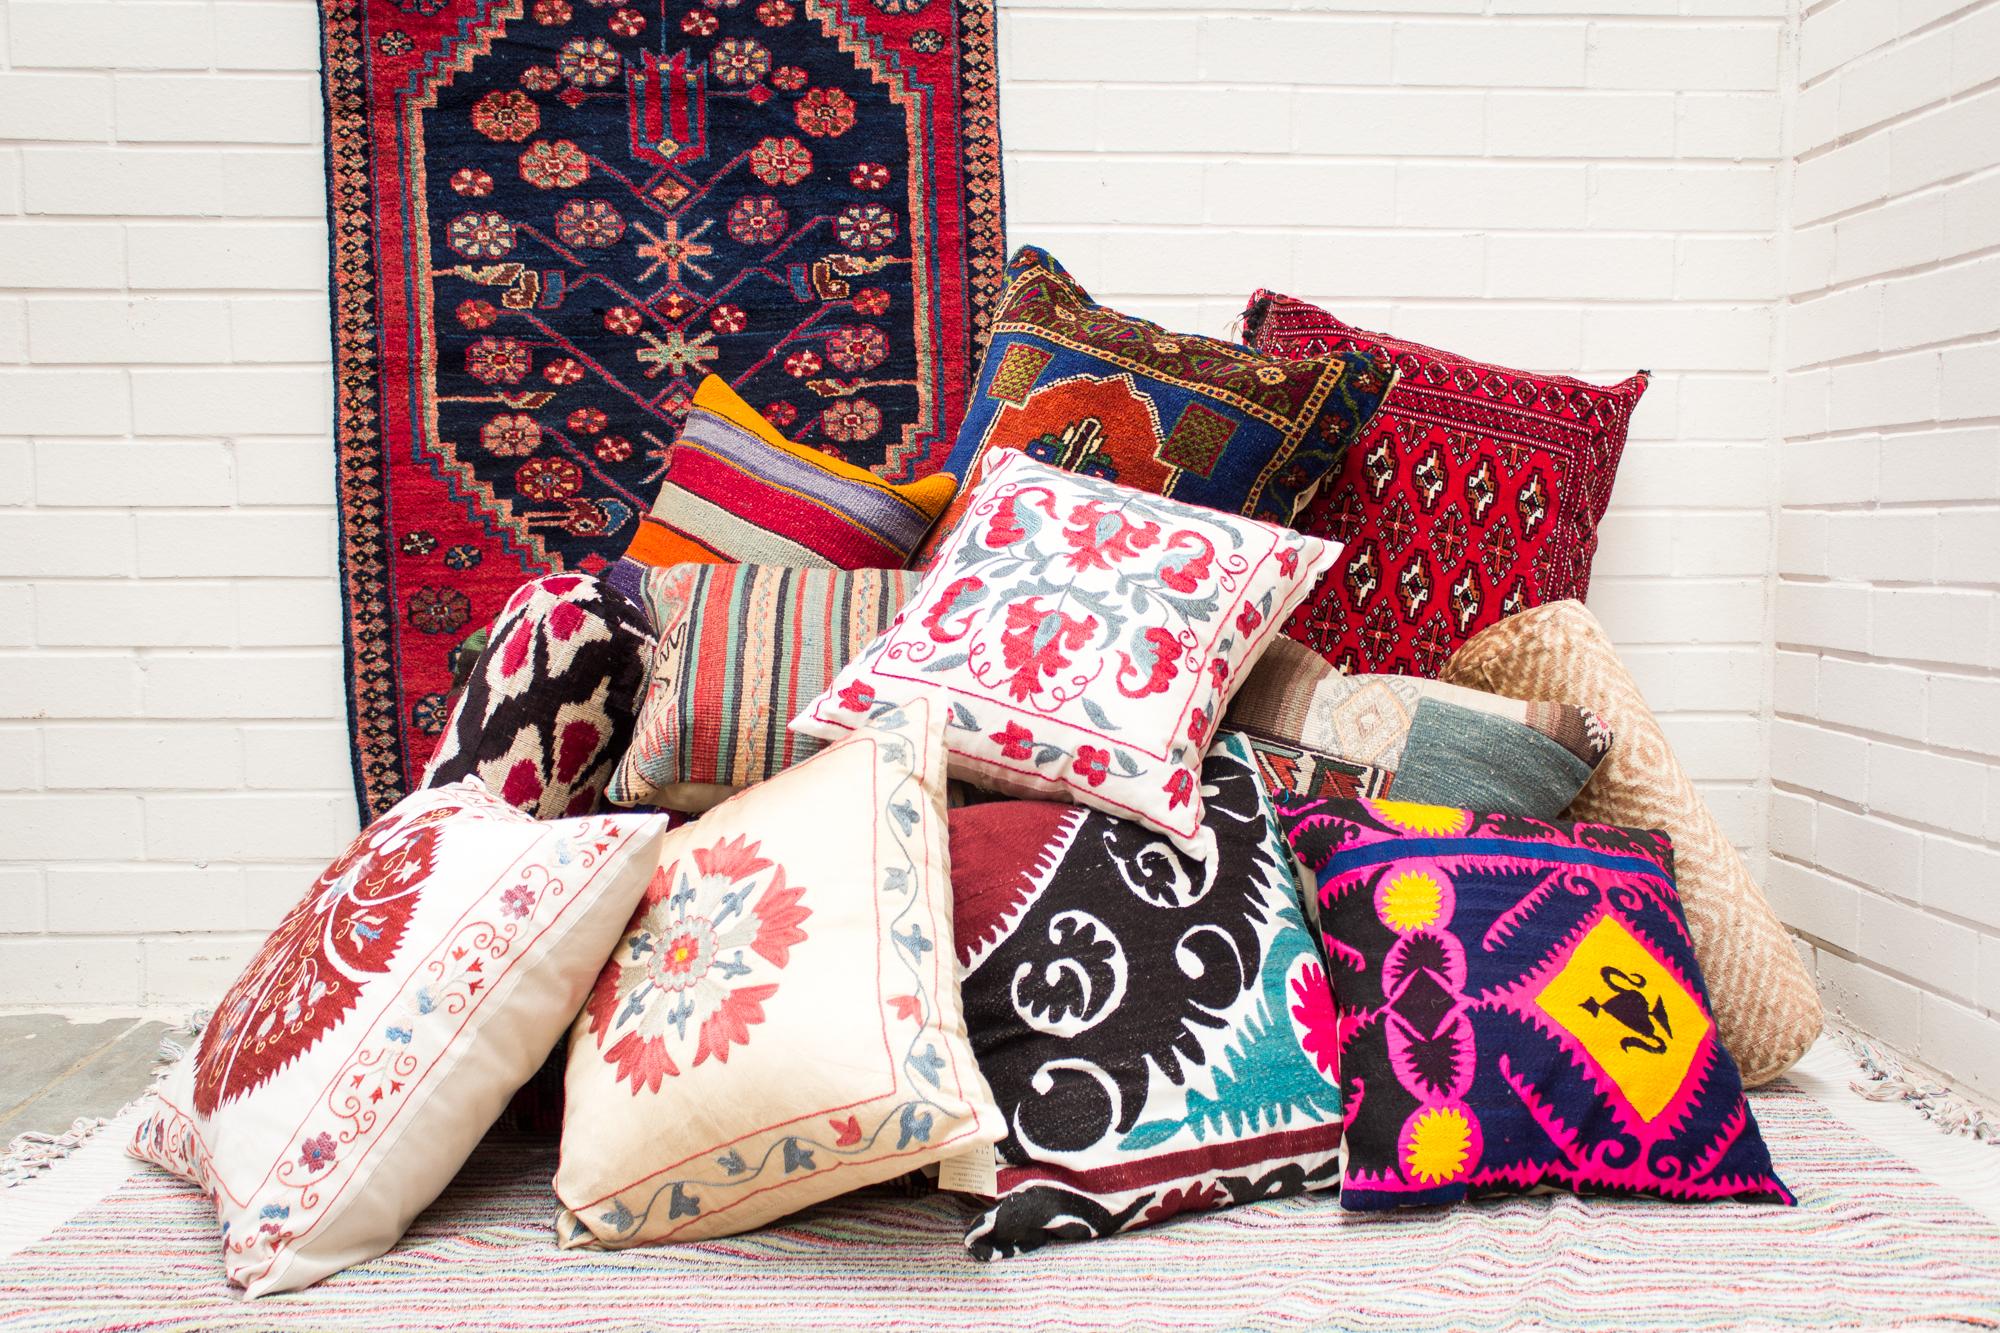 Turkish and Ottoman empire Cushions, rug fragments, kilims and suzani